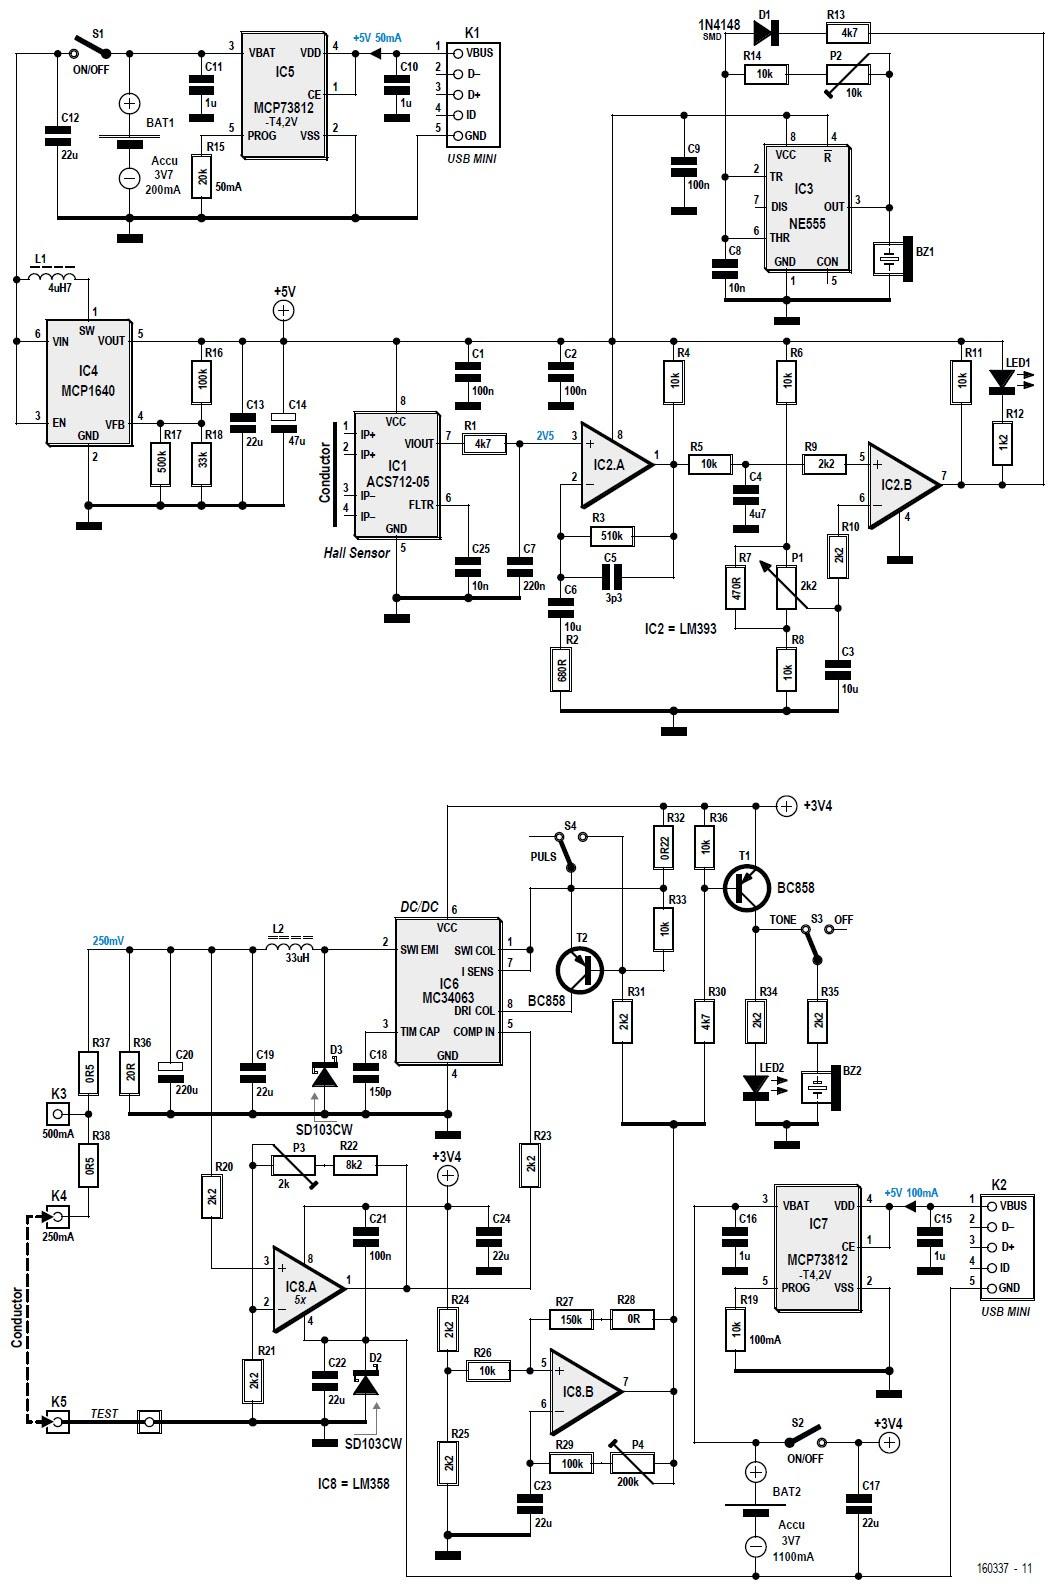 [Download 36+] Schema Impianto Elettrico Hm 50 Motard